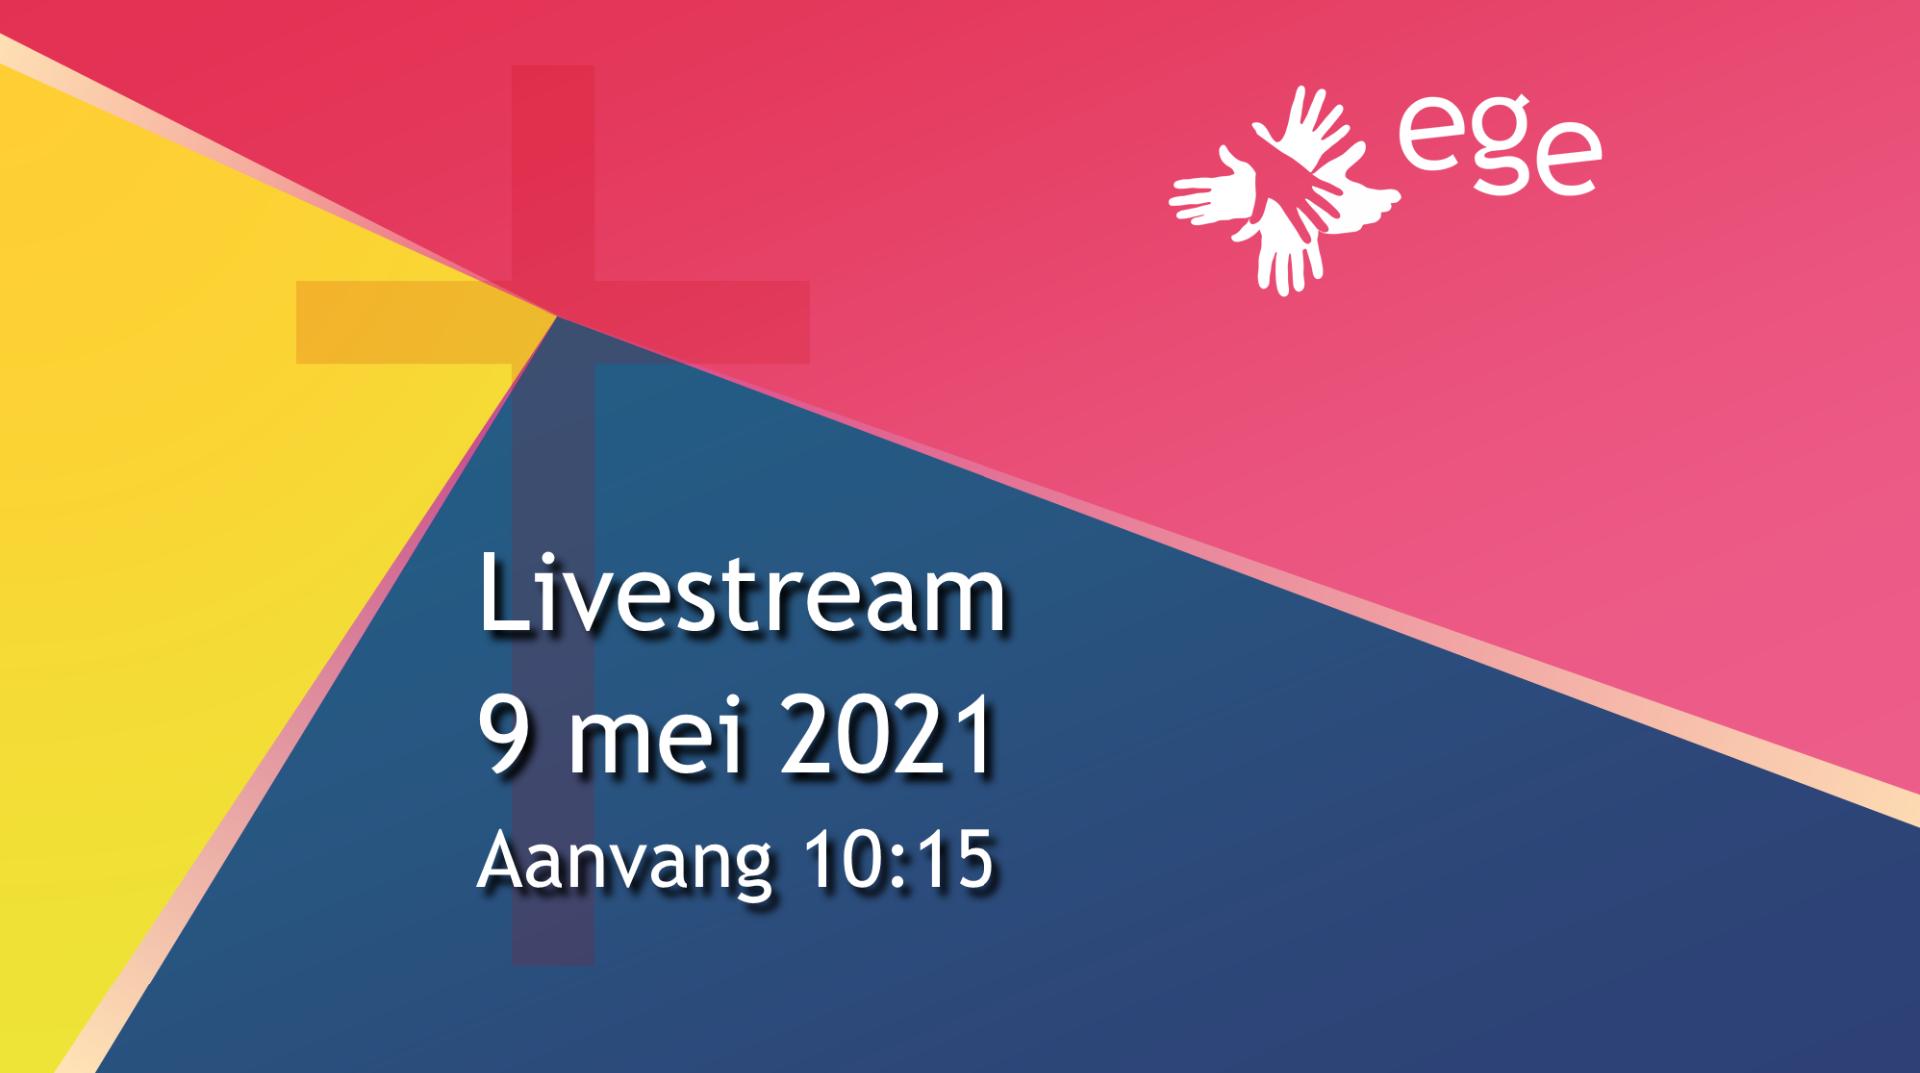 Livestream 9 mei 2021